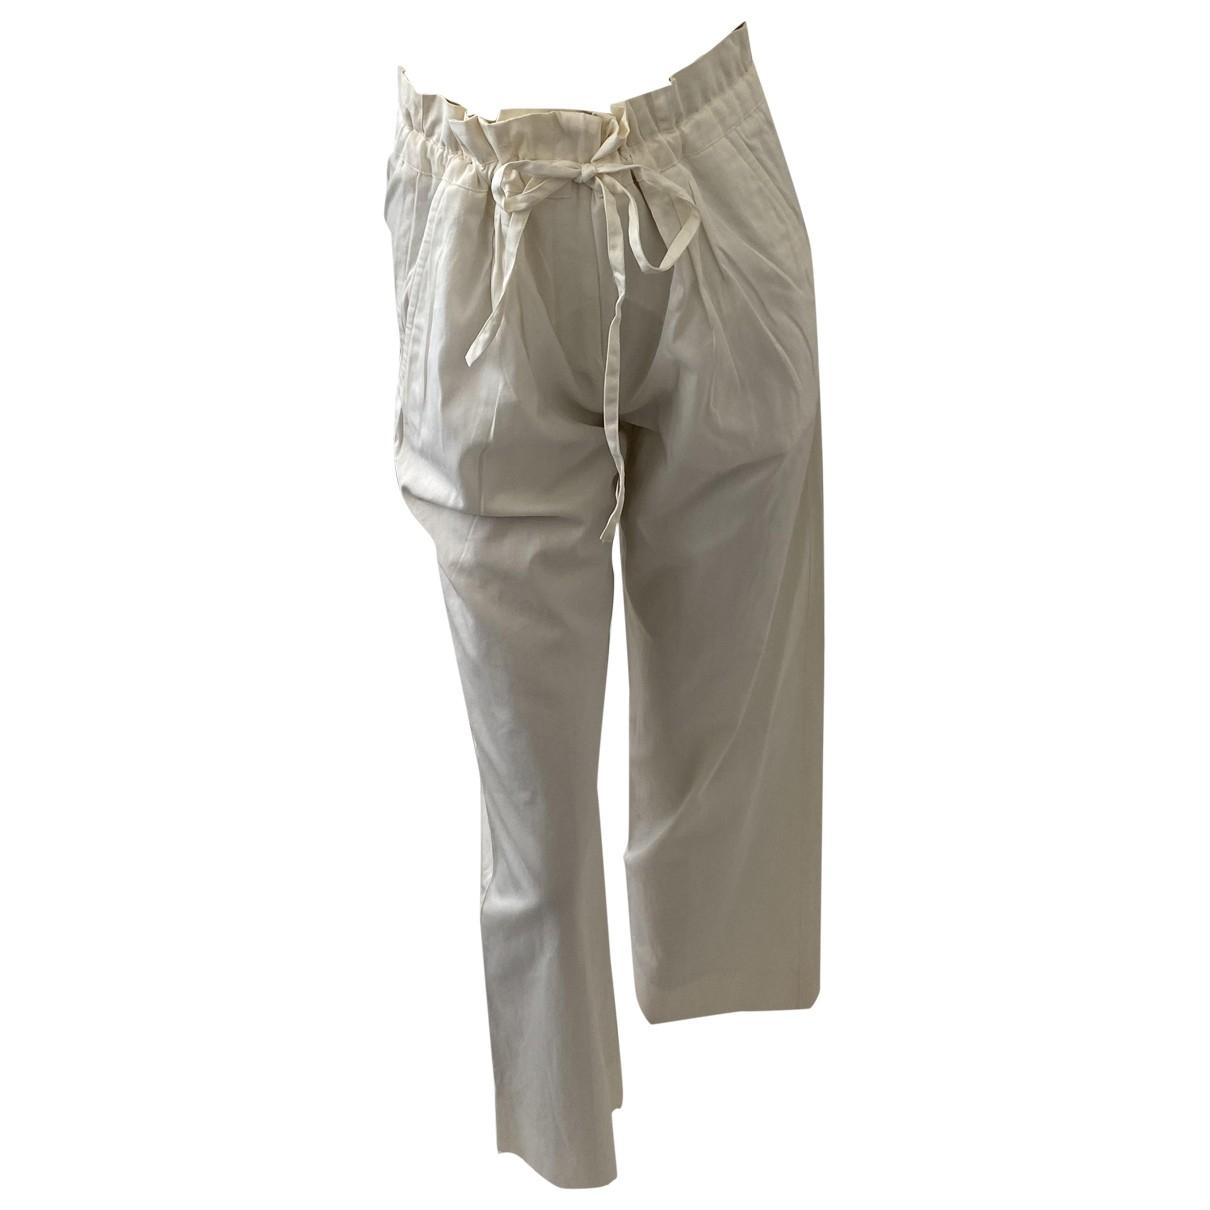 Pantalon en Algodon Blanco Yves Saint Laurent